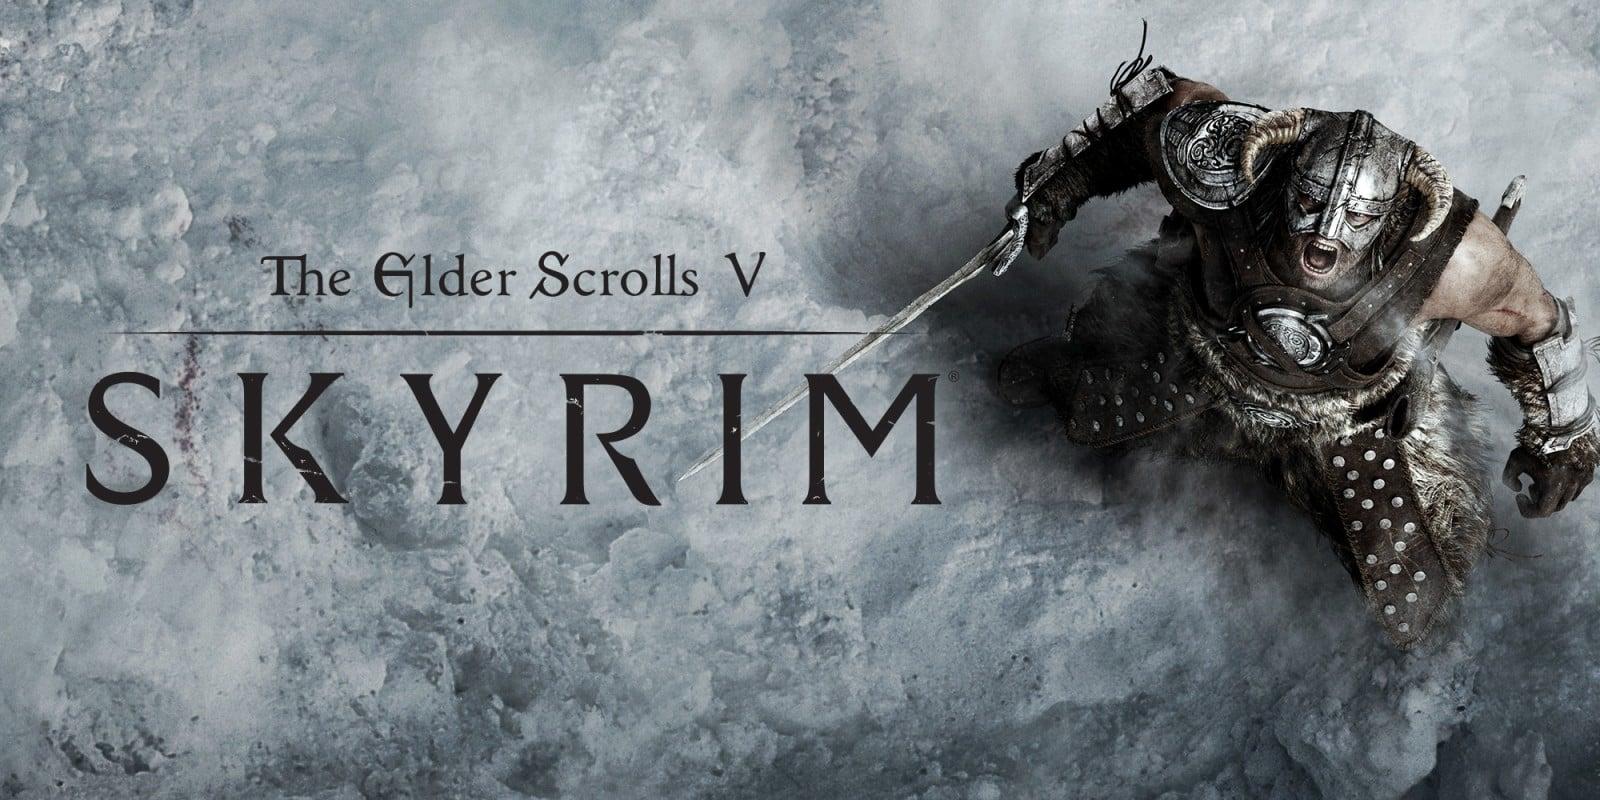 The Elder Scrolls V Skyrim Full Version PC Game Download